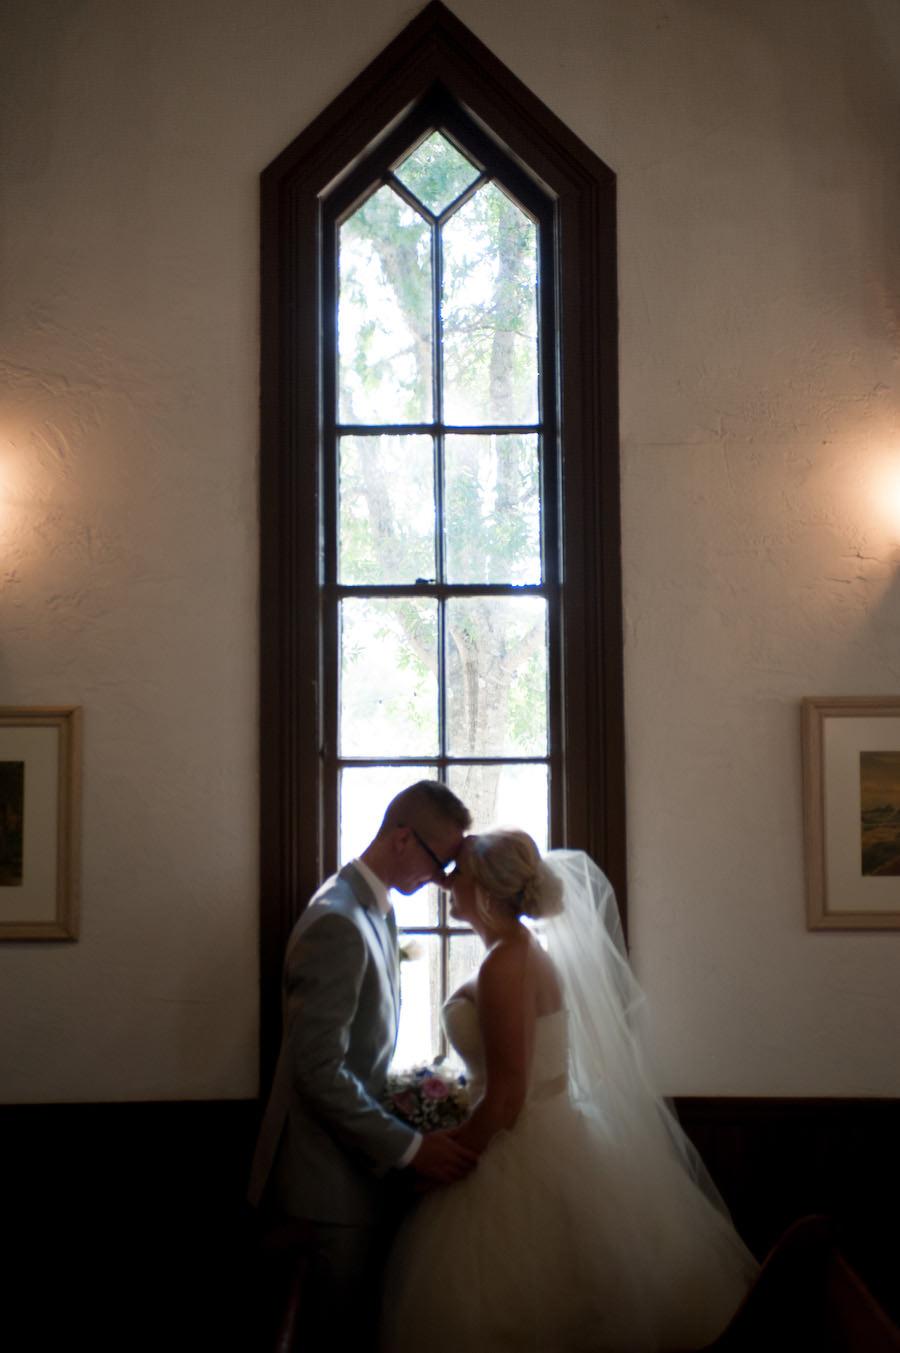 Bride and Groom Wedding Portrait at Dunedin Historic Wedding Ceremony Church Venue St. Andrew's Memorial Chapel